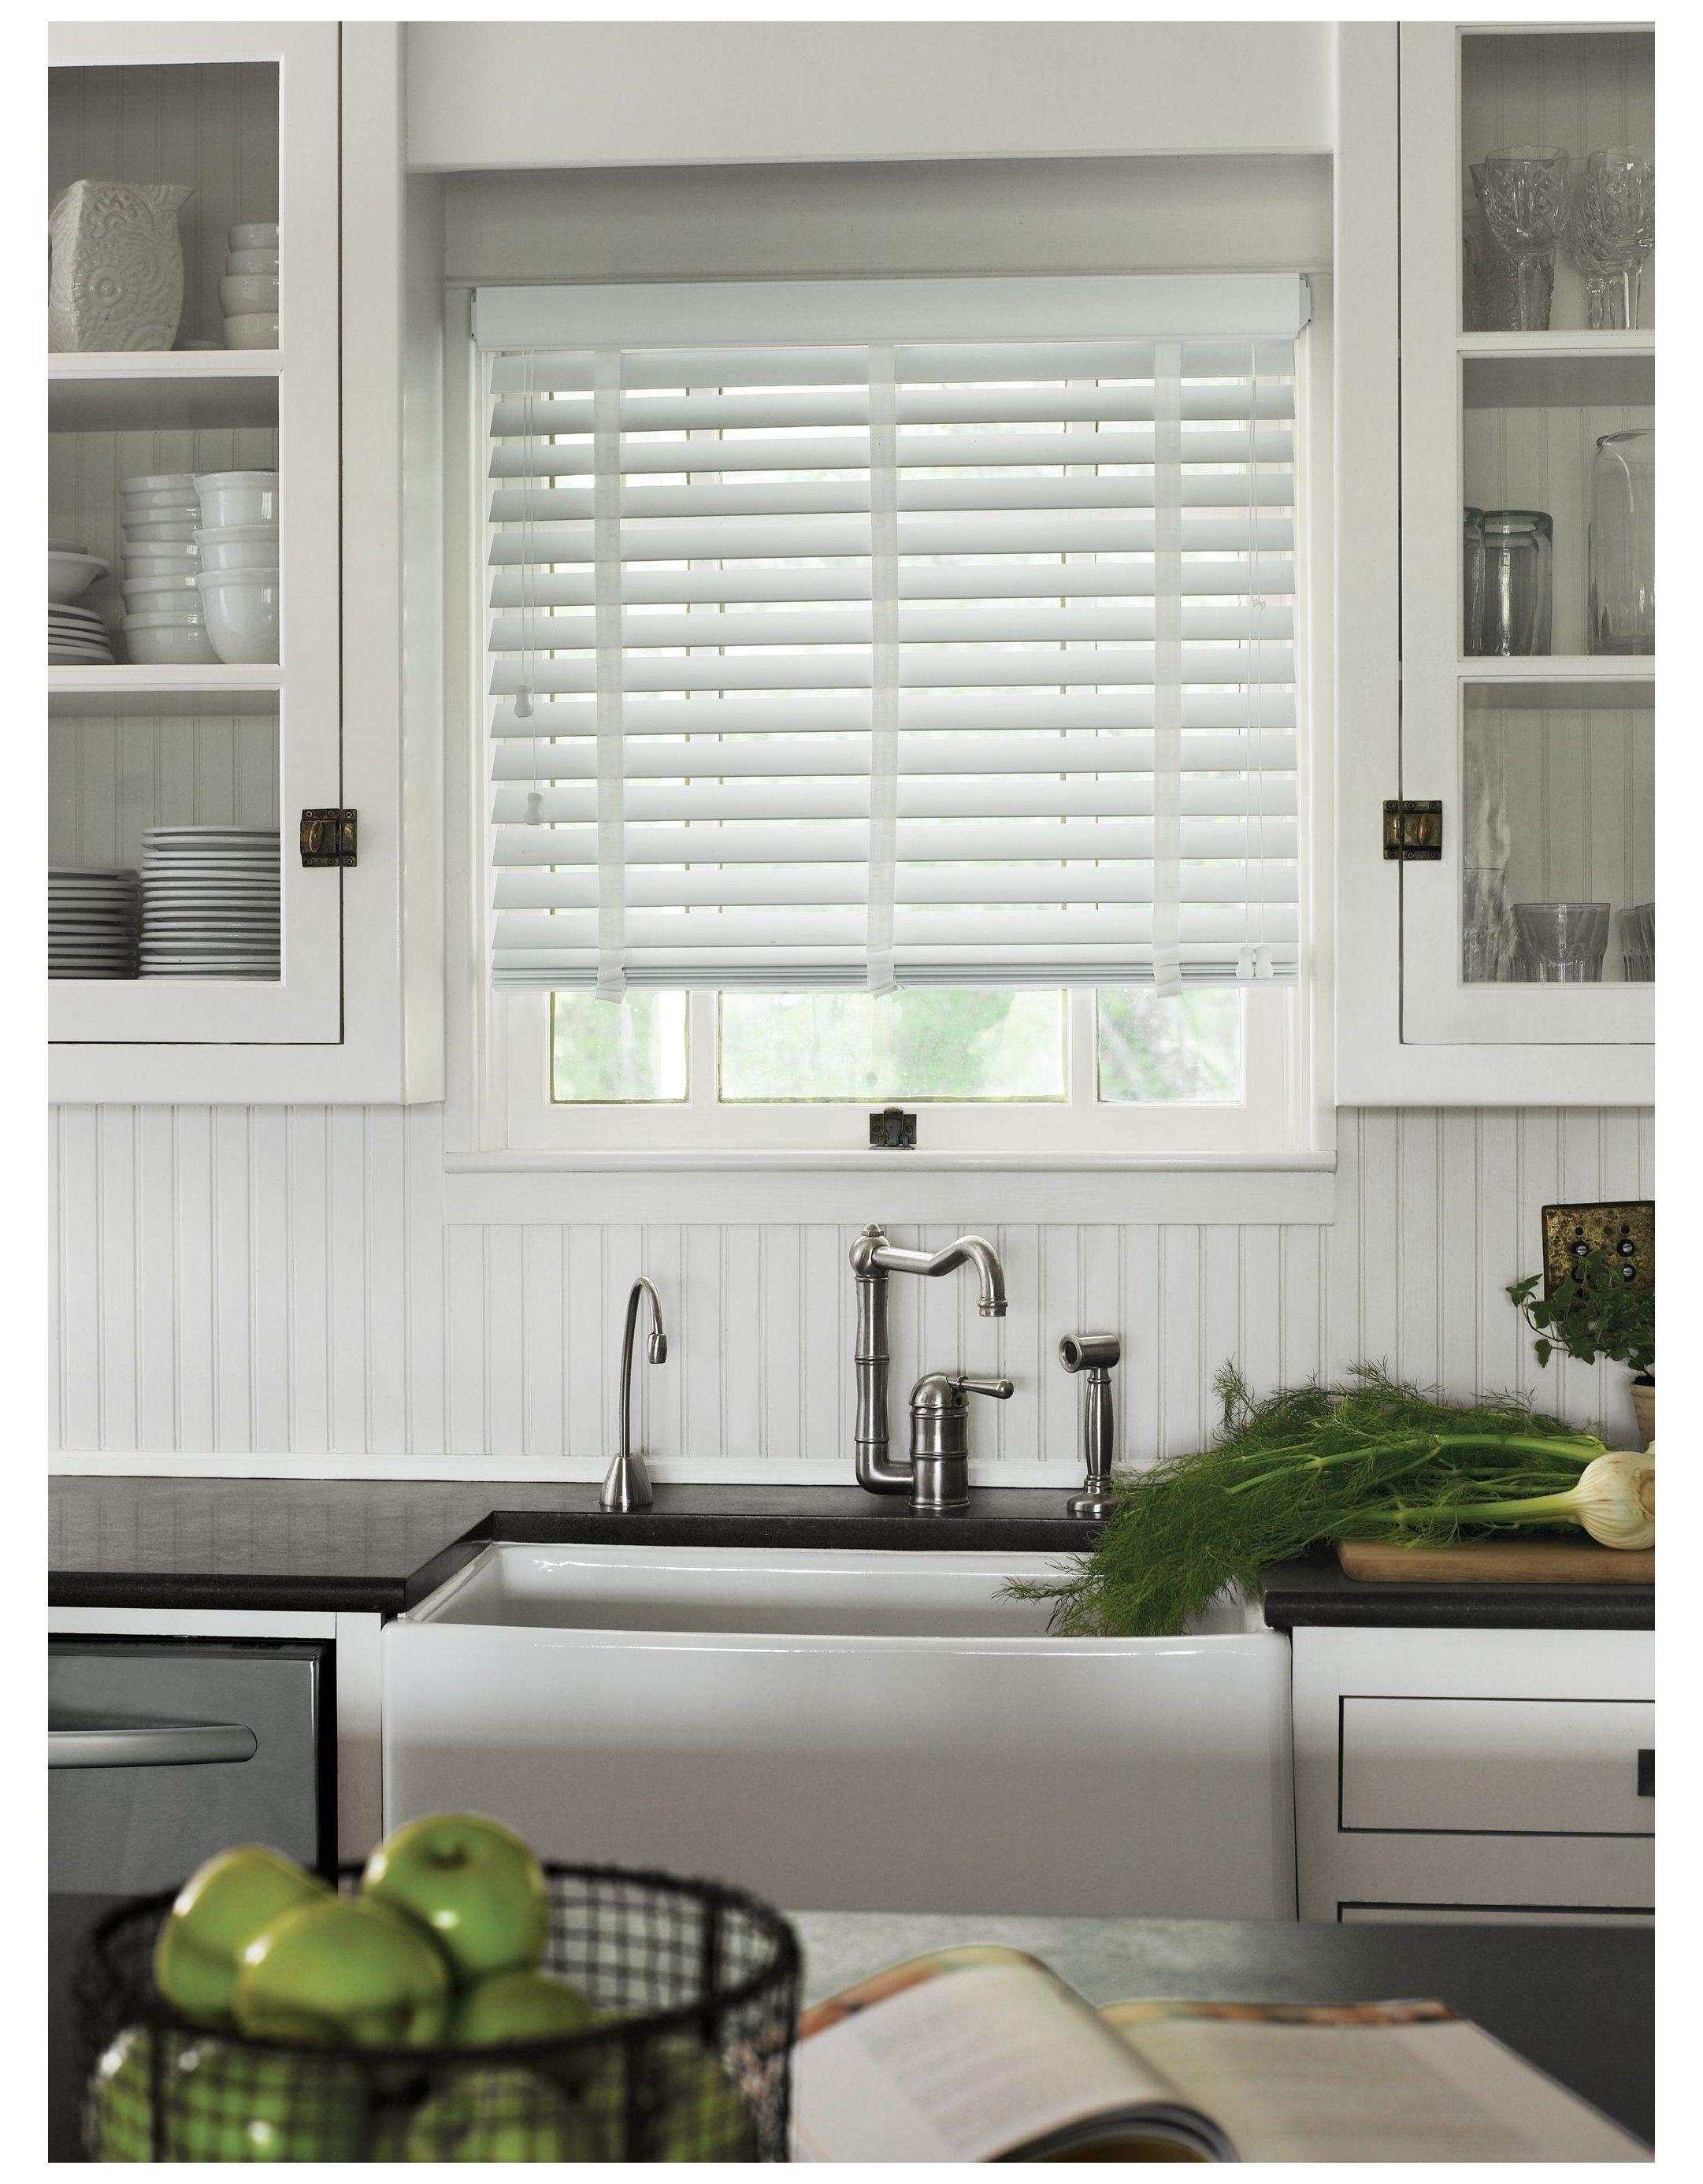 Wood Blinds Modern Kitchen Window Treatments Over Sink Modernkitchenwindowtreatmen In 2021 Modern Kitchen Window White Kitchen Windows Kitchen Window Treatments